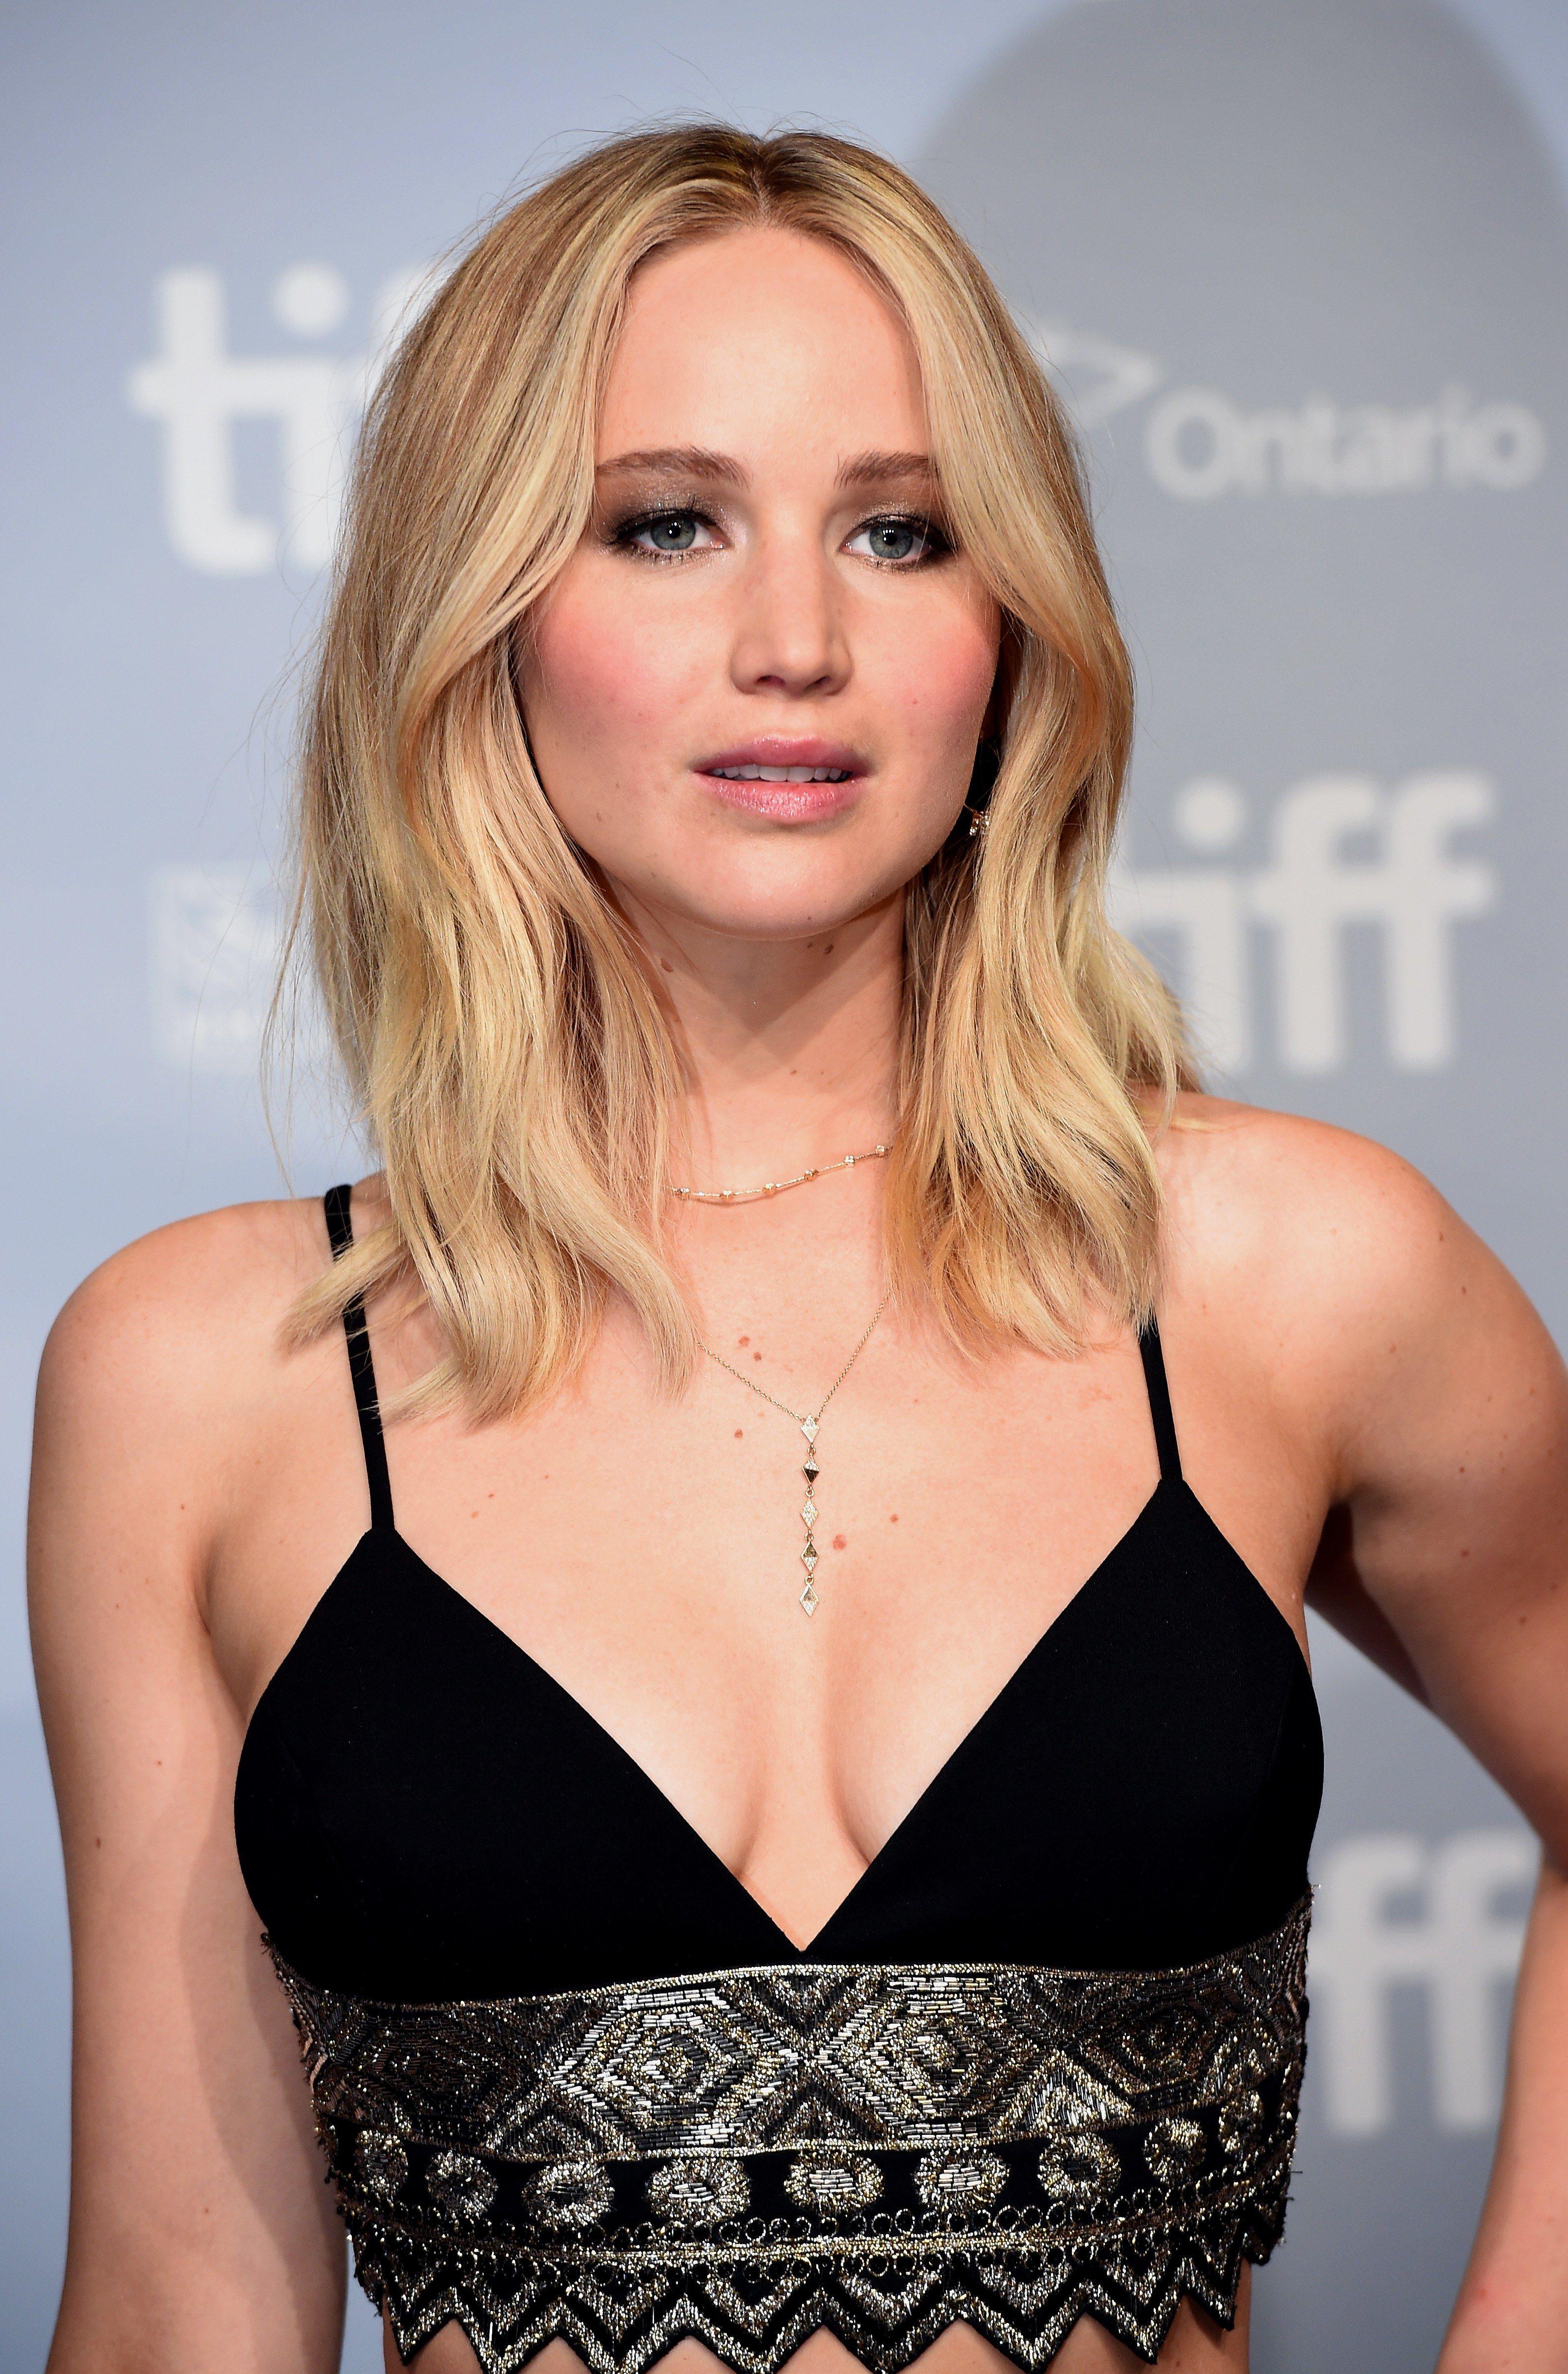 Jennifer Lawrence S Hair Evolution From Blonde To Brunette Long To Short Jennifer Lawrence Hair Jennifer Lawrence Short Hair Jennifer Lawrence Blonde